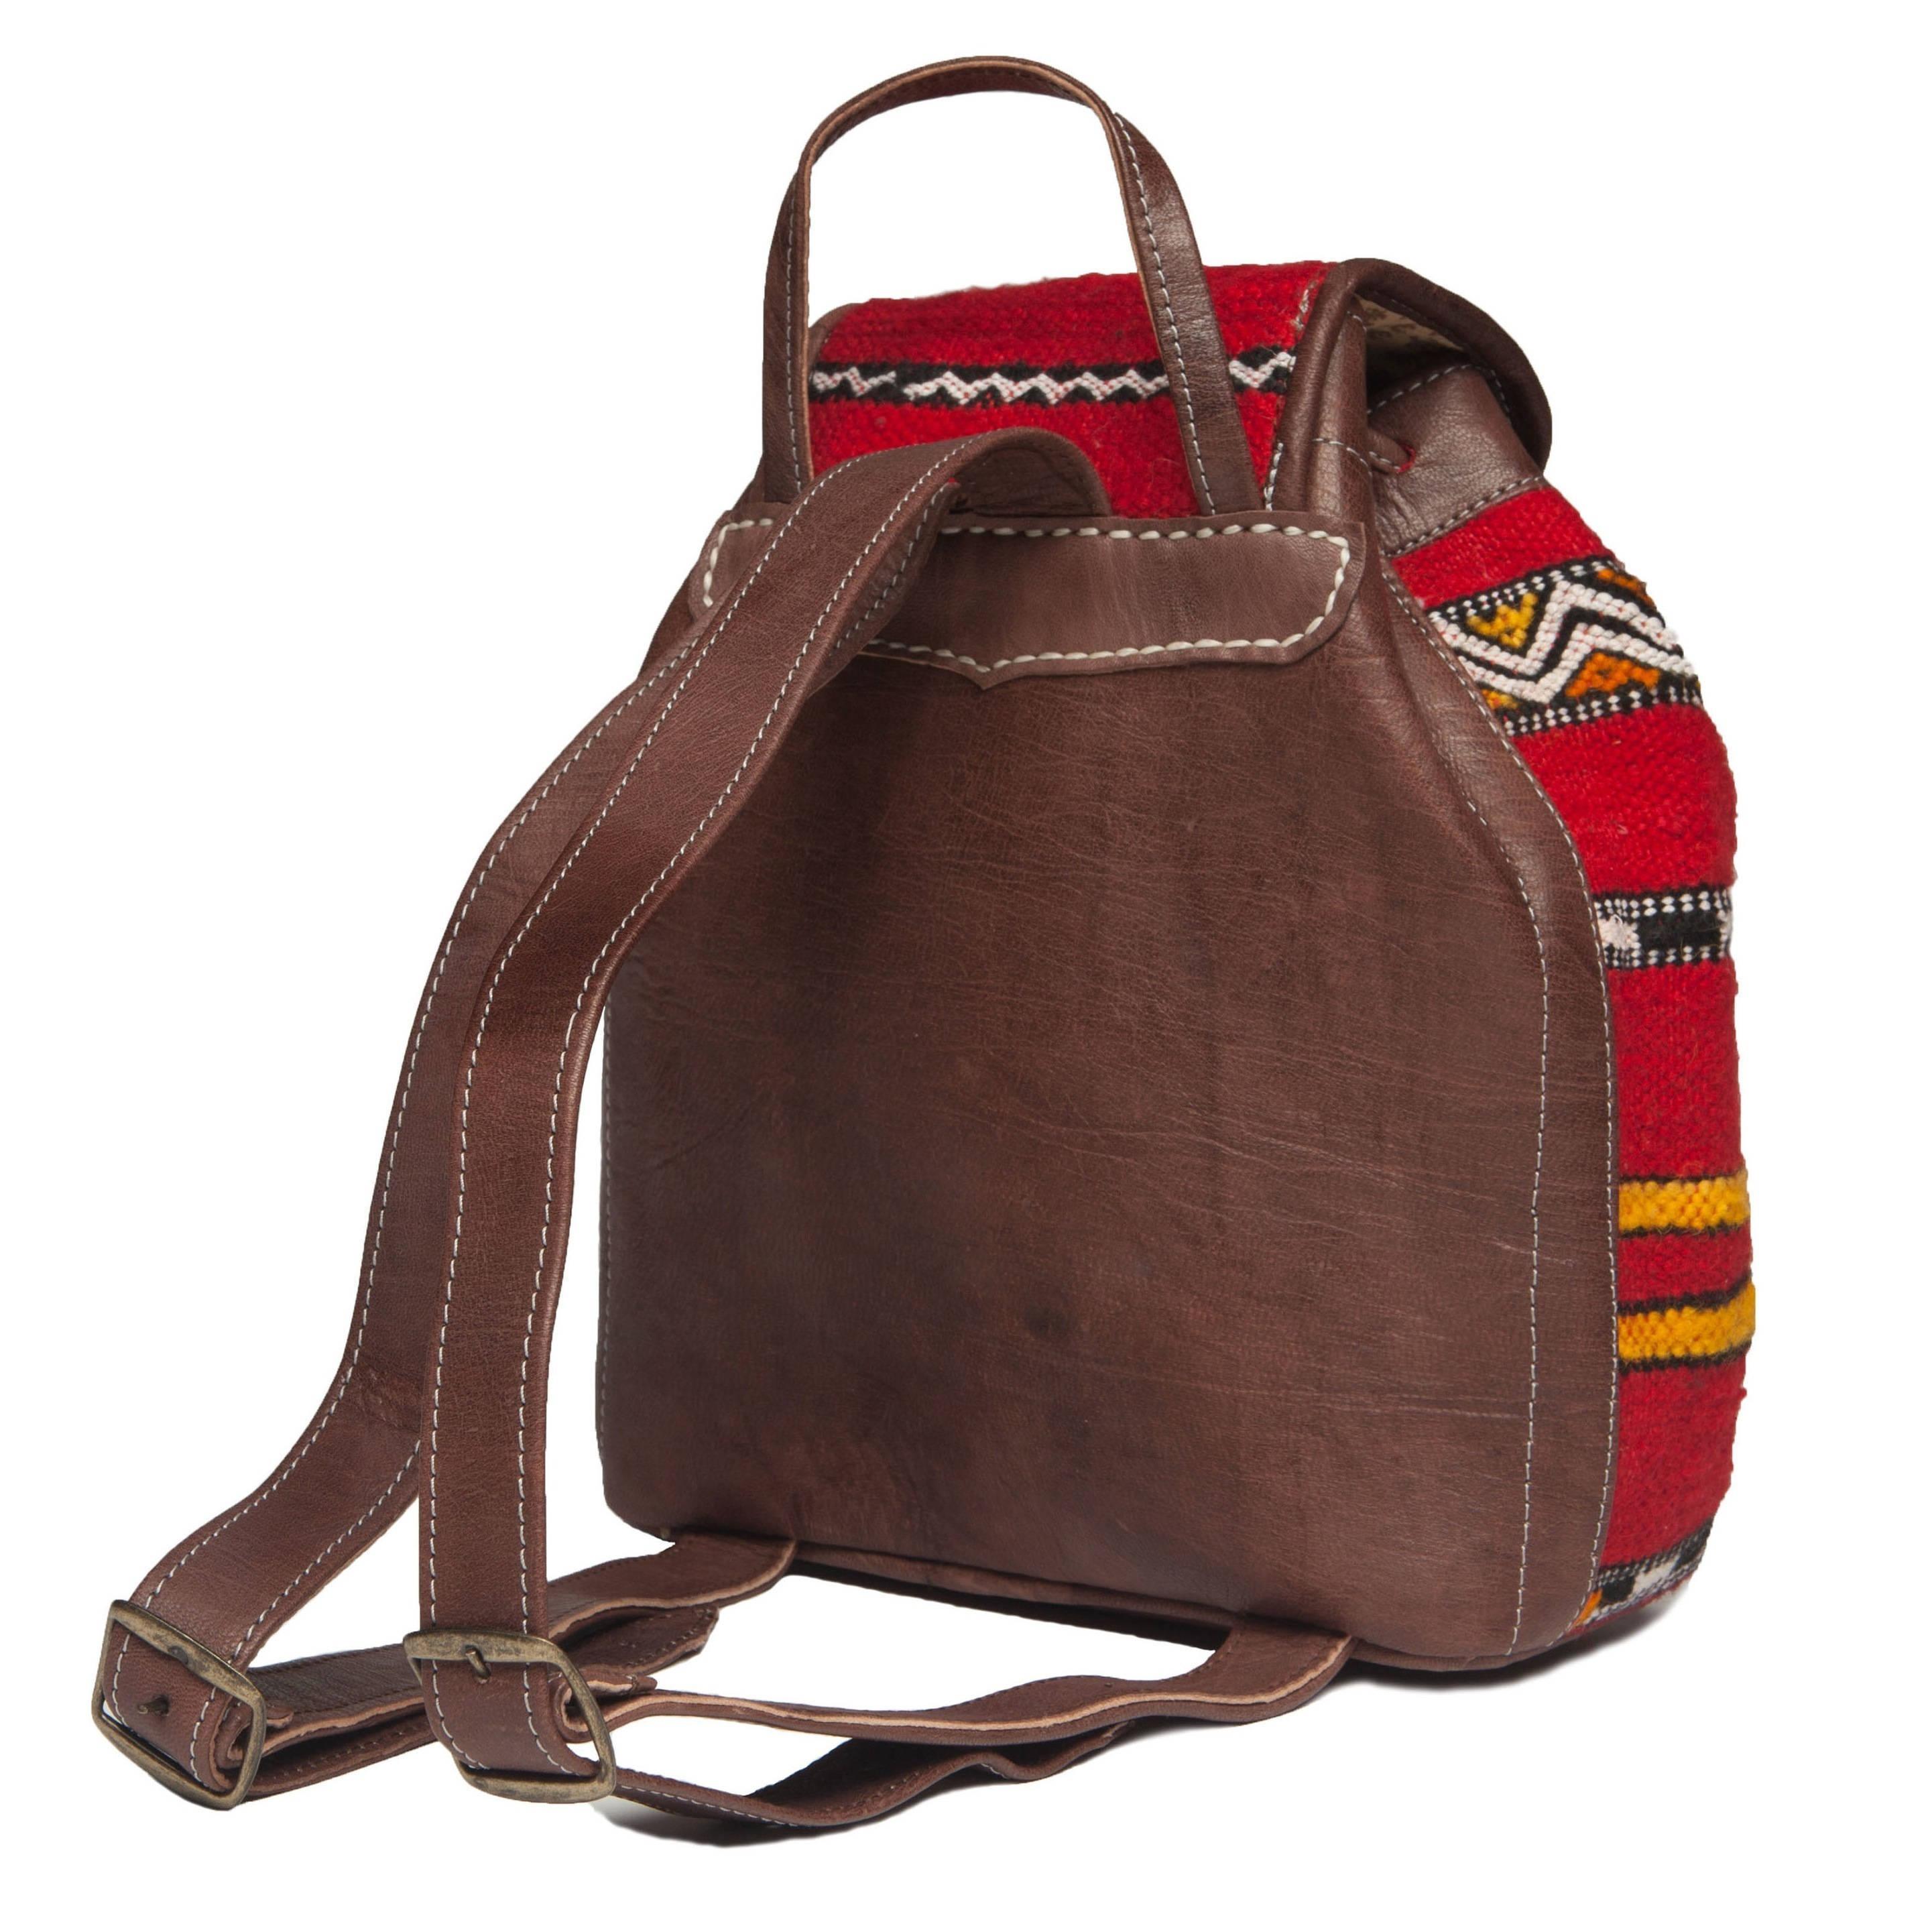 389d5daa2e0 Shop Handmade Leather and Kilim Backpack (Morocco) - Free Shipping ...